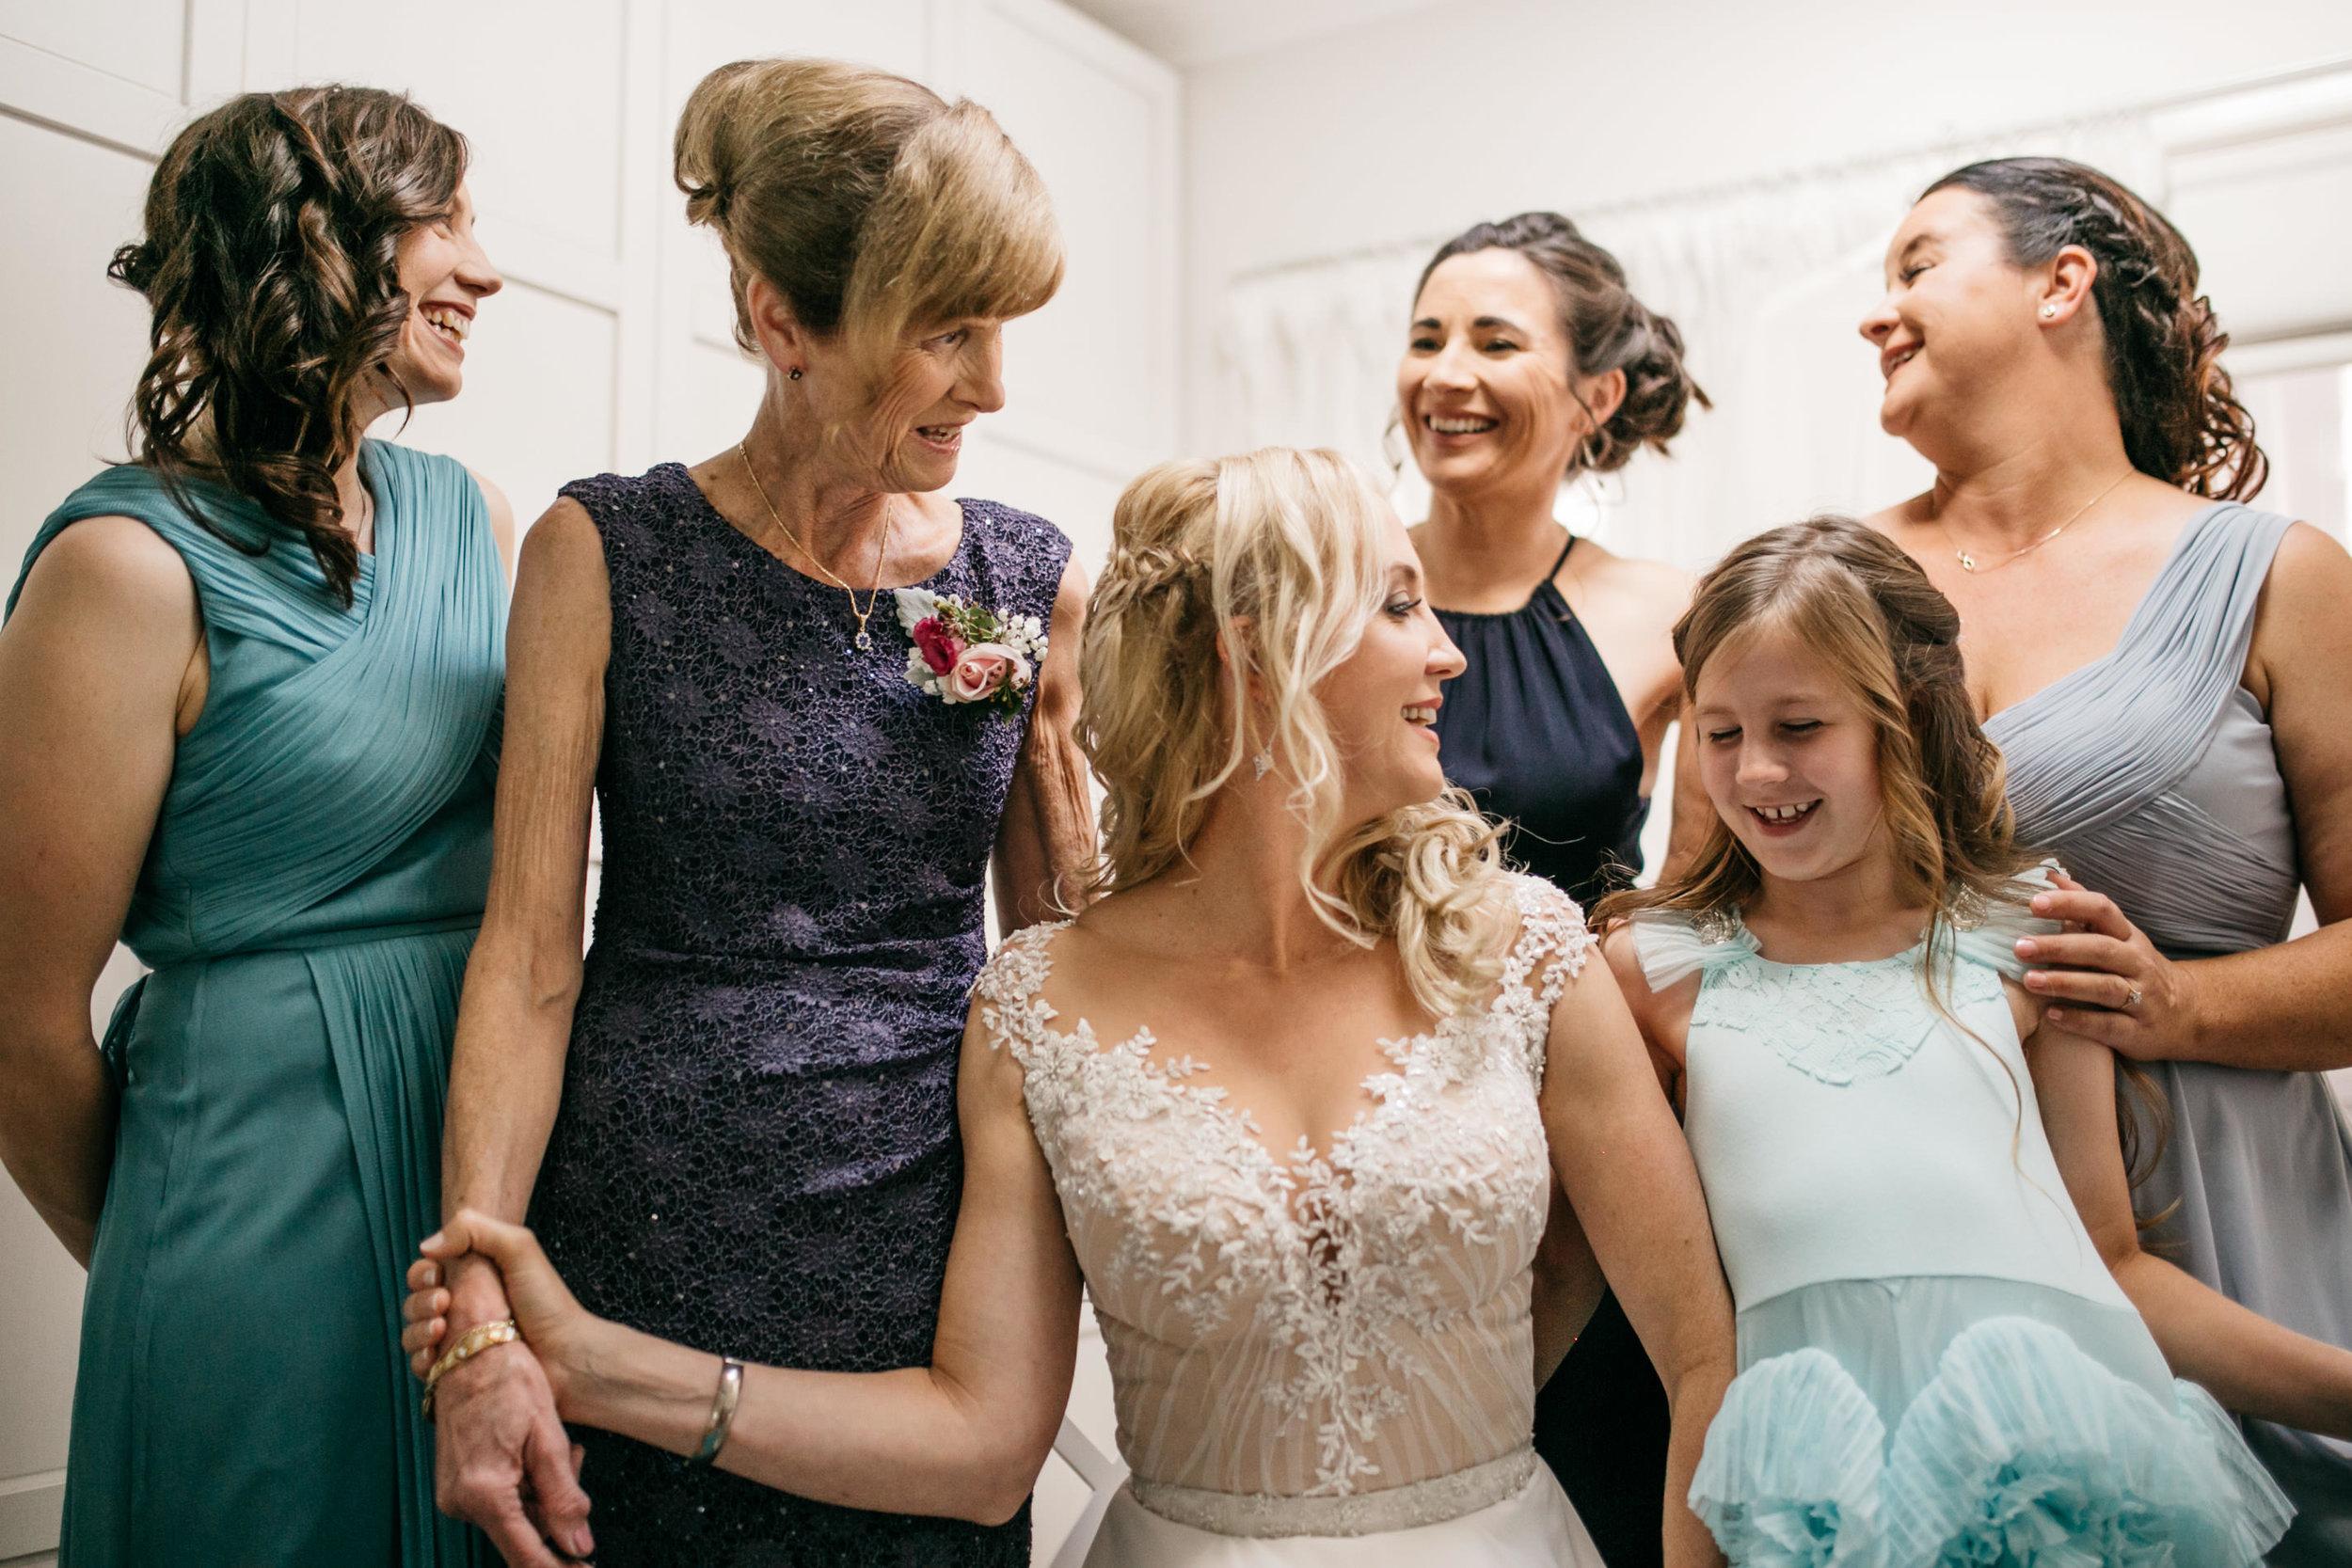 True North Photography_Boomerang Farm_Stacey and Isaac_Gold Coast Wedding_Barm Wedding_Hinterland Wedding-47.jpg